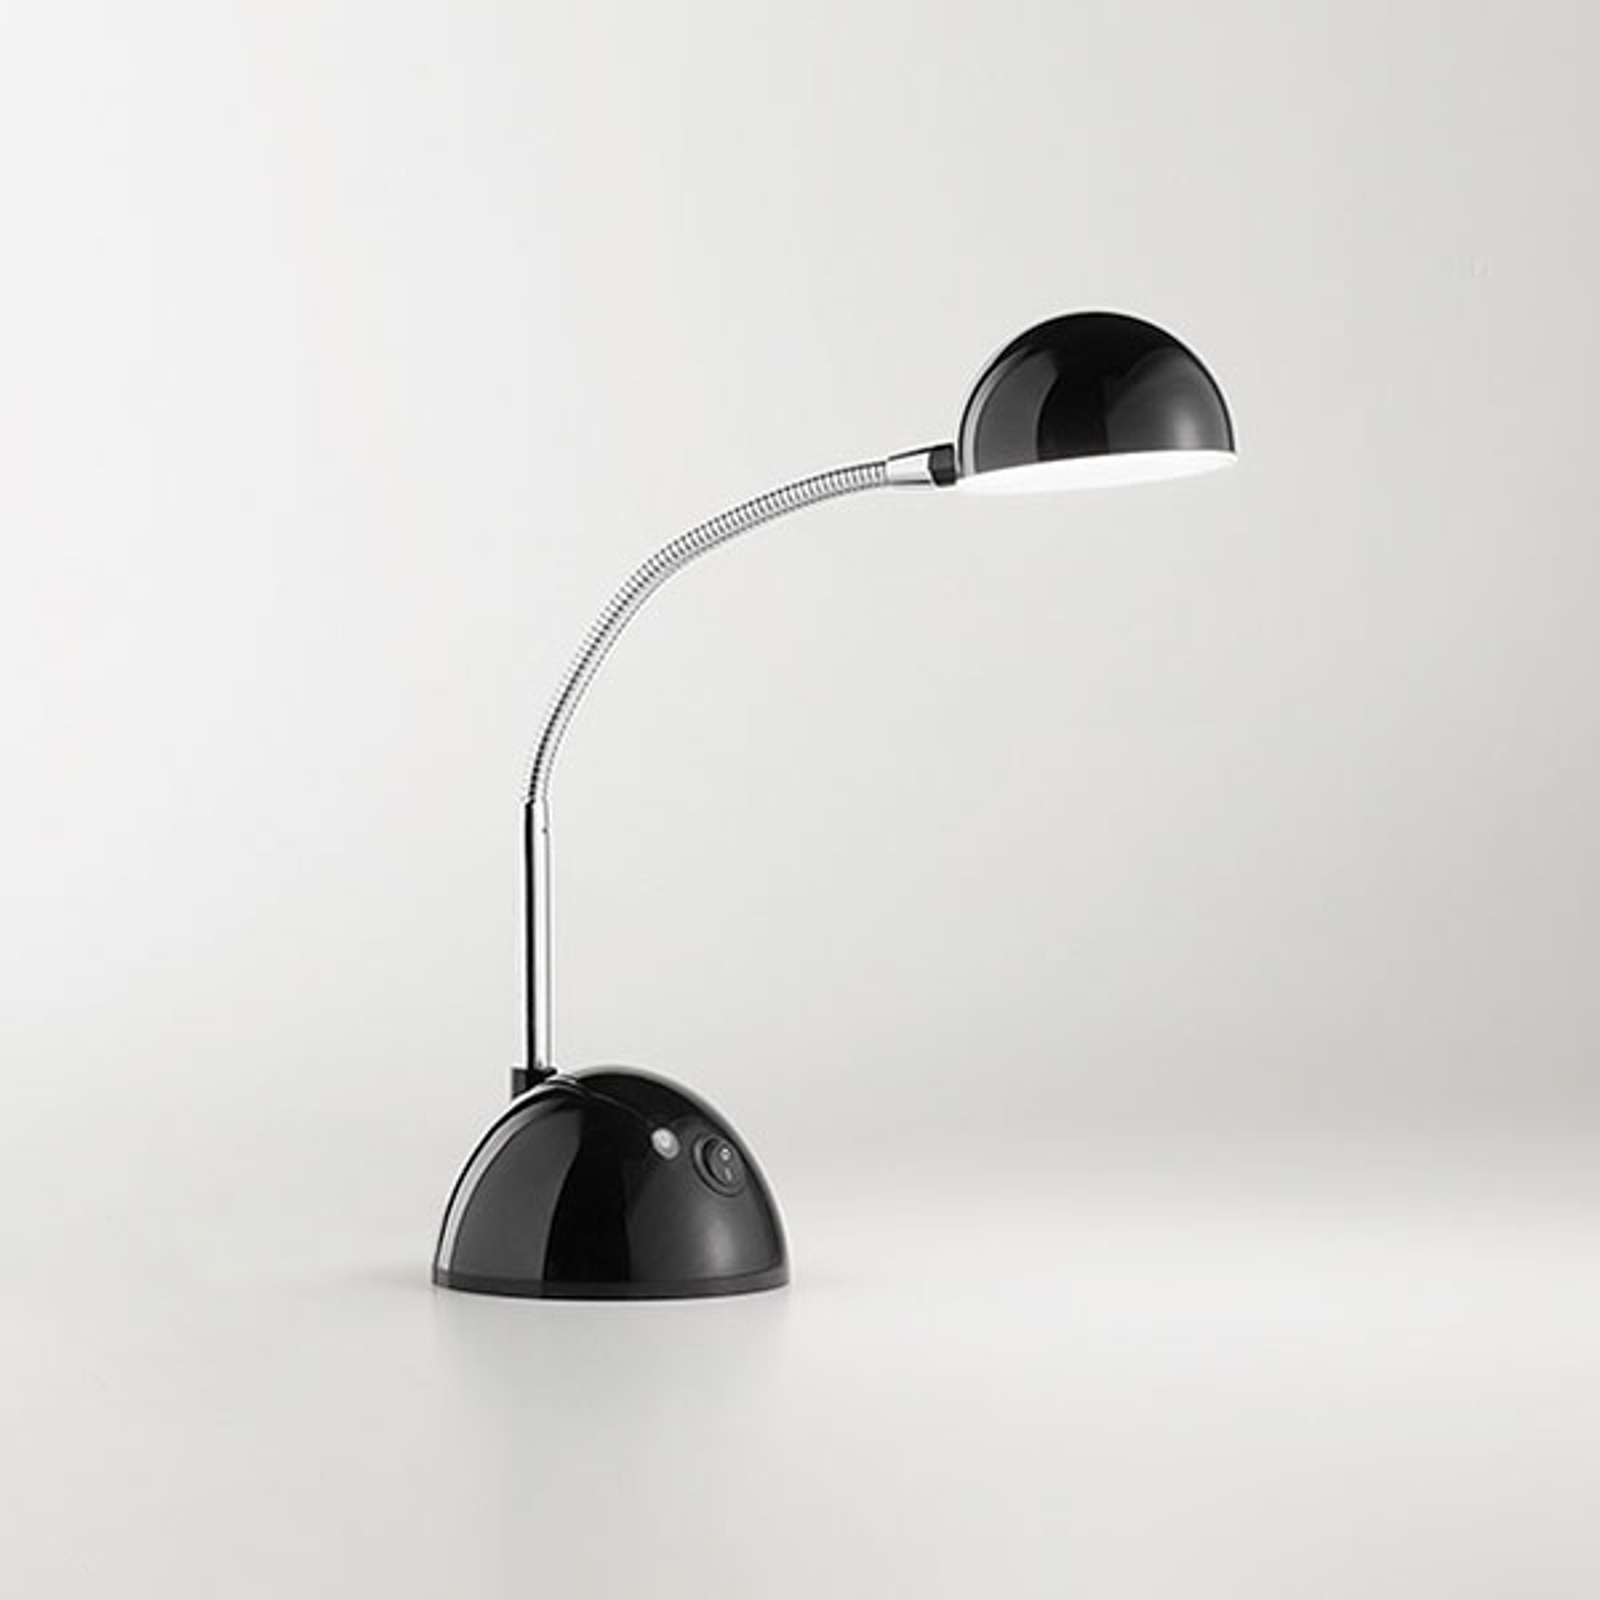 LED tafellamp 6512 met flexibele arm, zwart